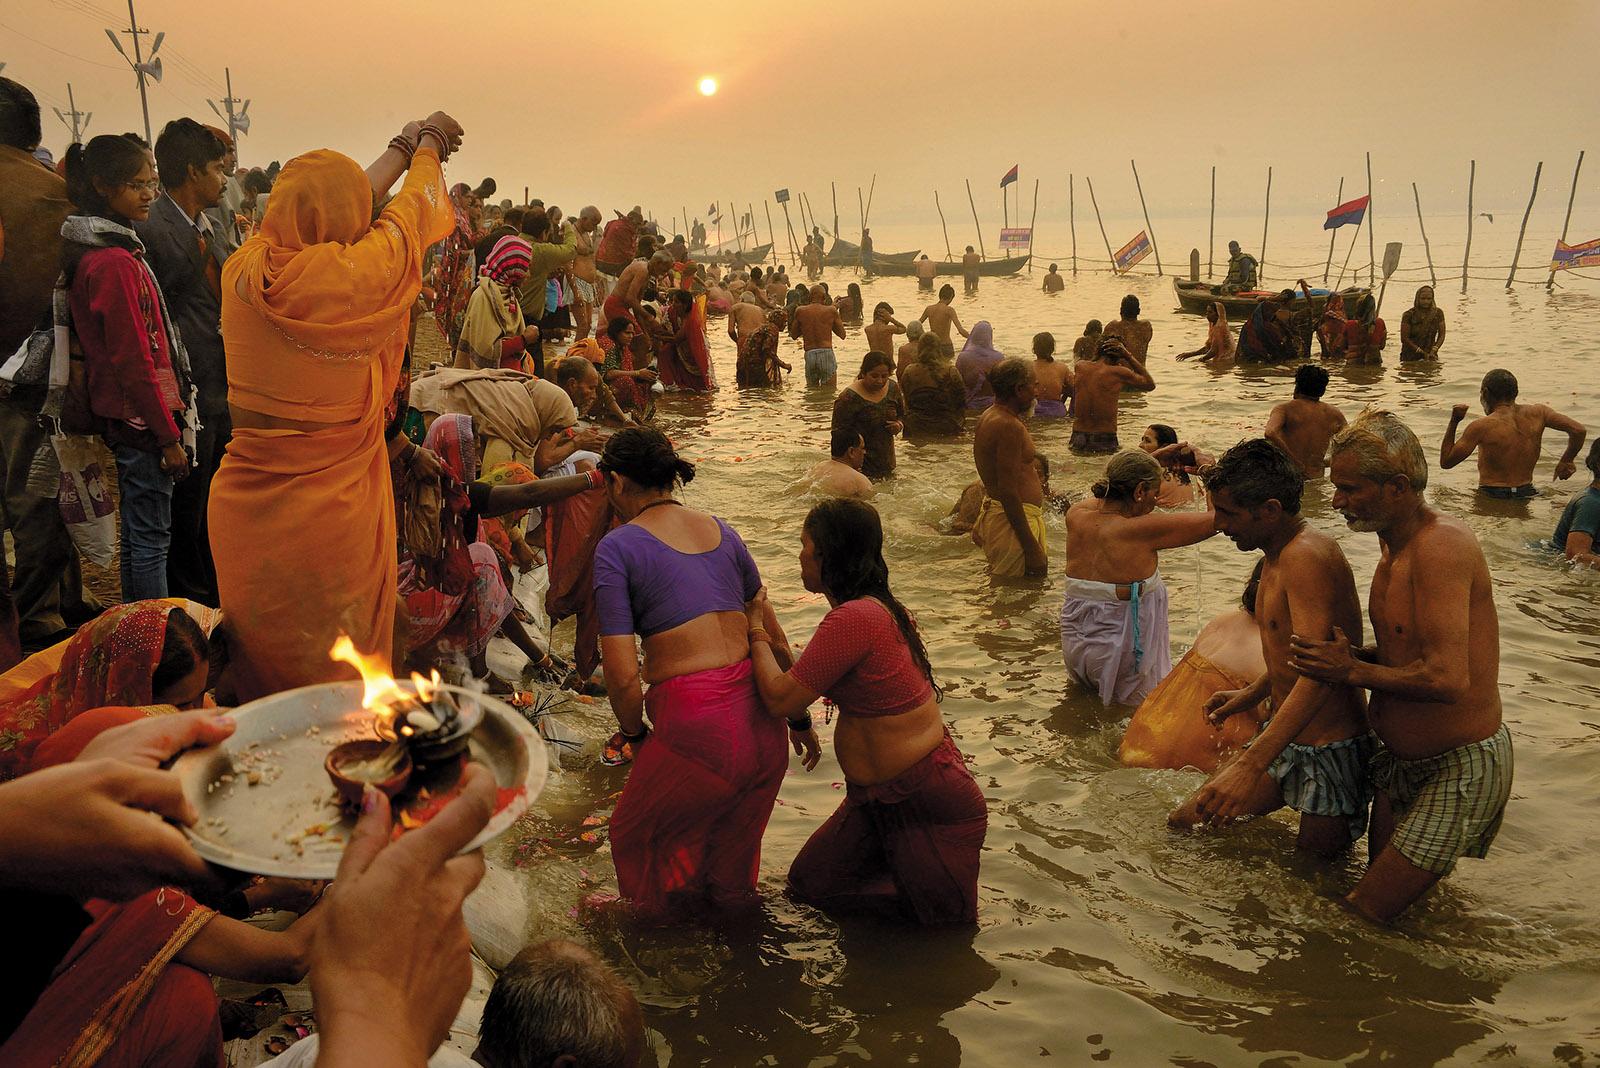 Hindu pilgrims bathing in the Ganges, Prayagraj, India, 2013